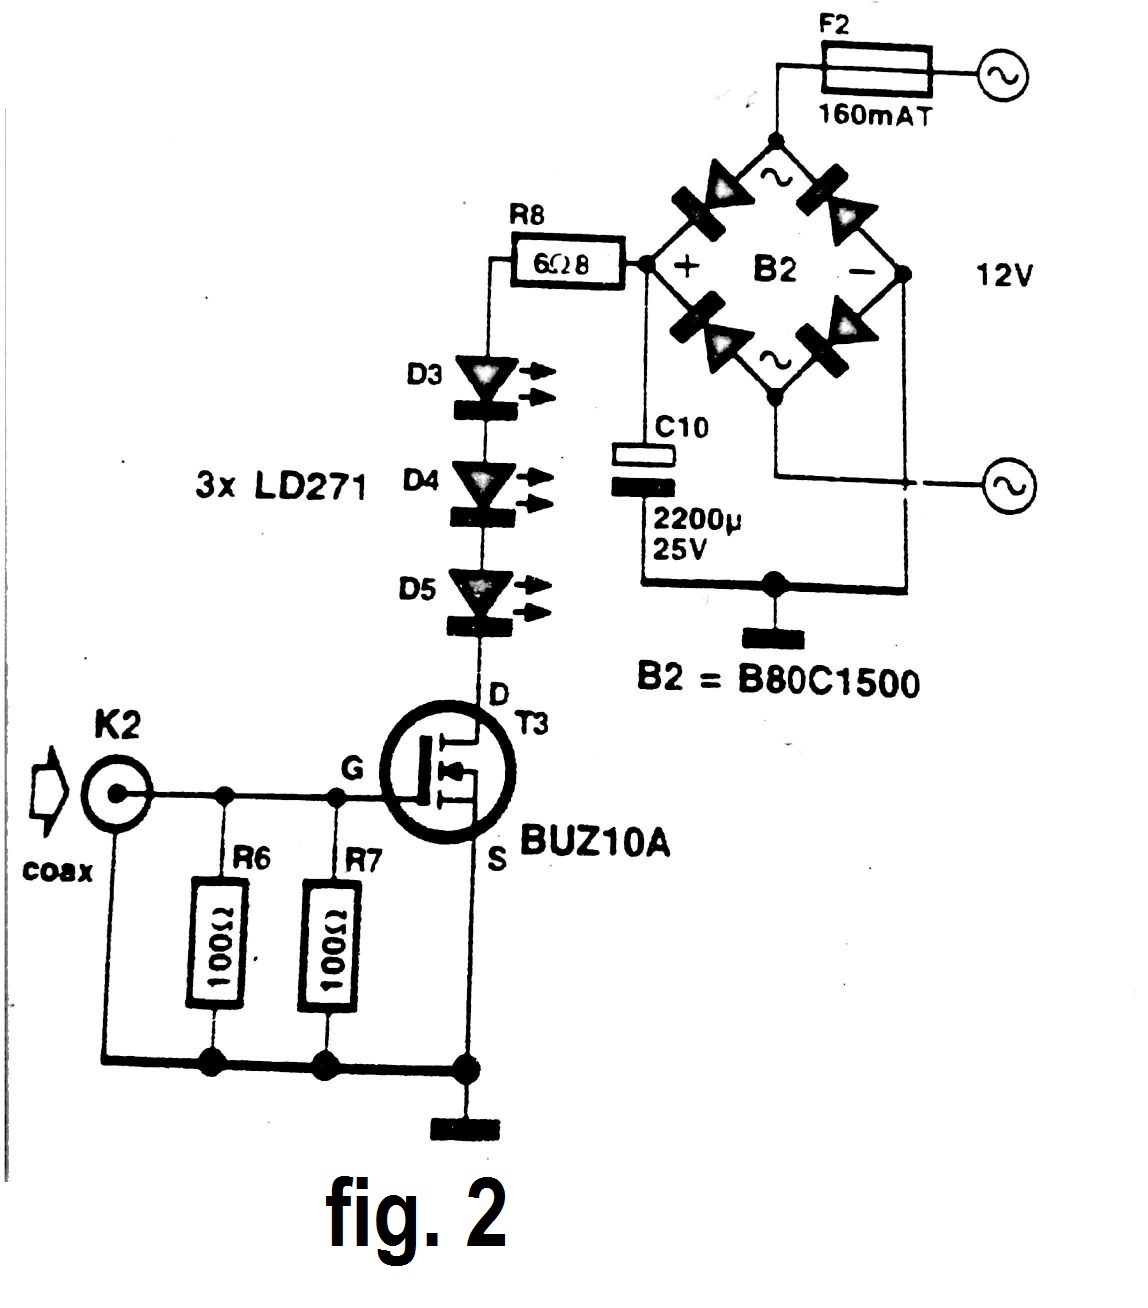 Infrared Signal Repeater Circuit Diagram